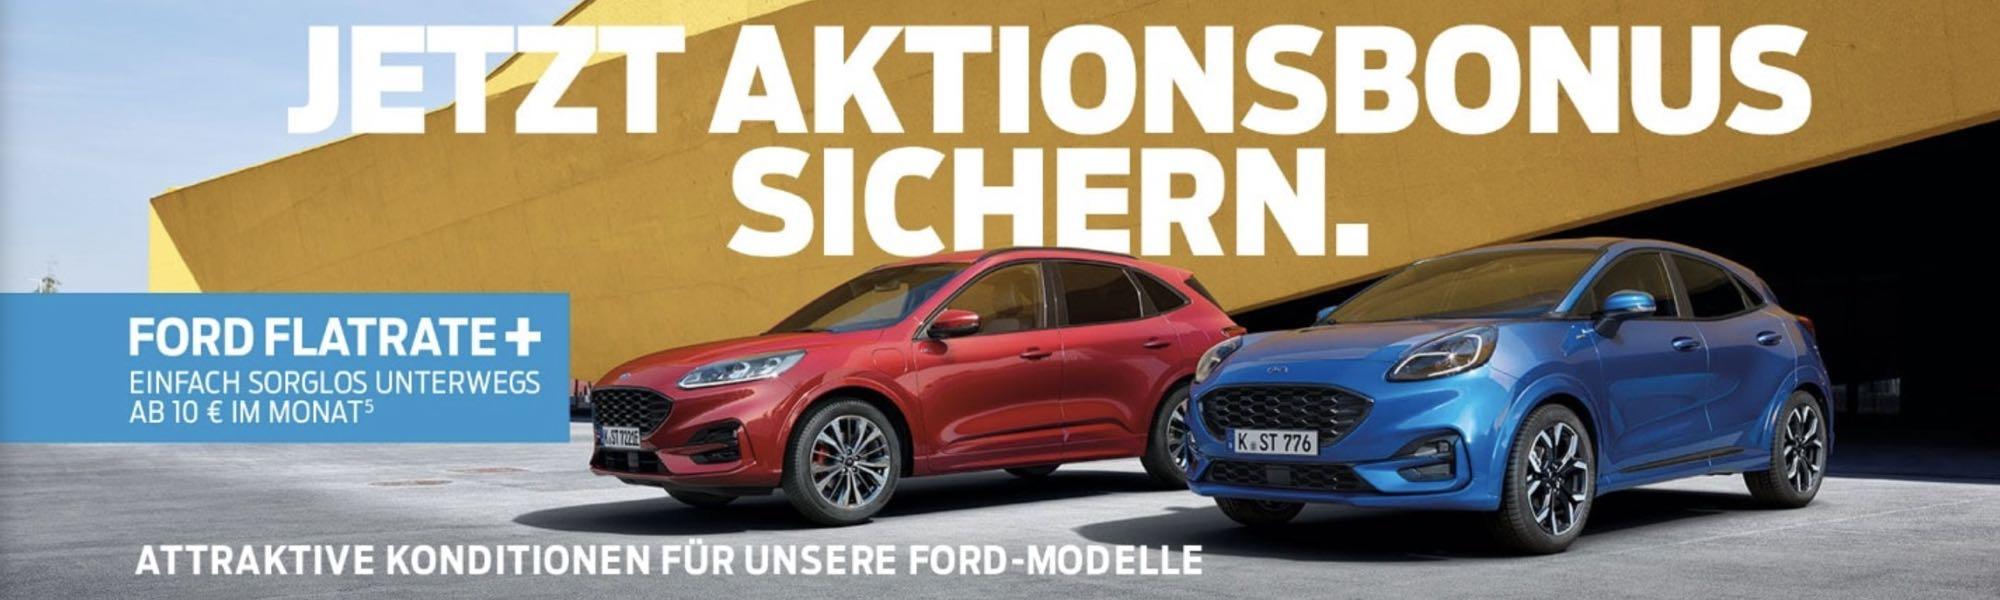 Ford Aktionsbonus